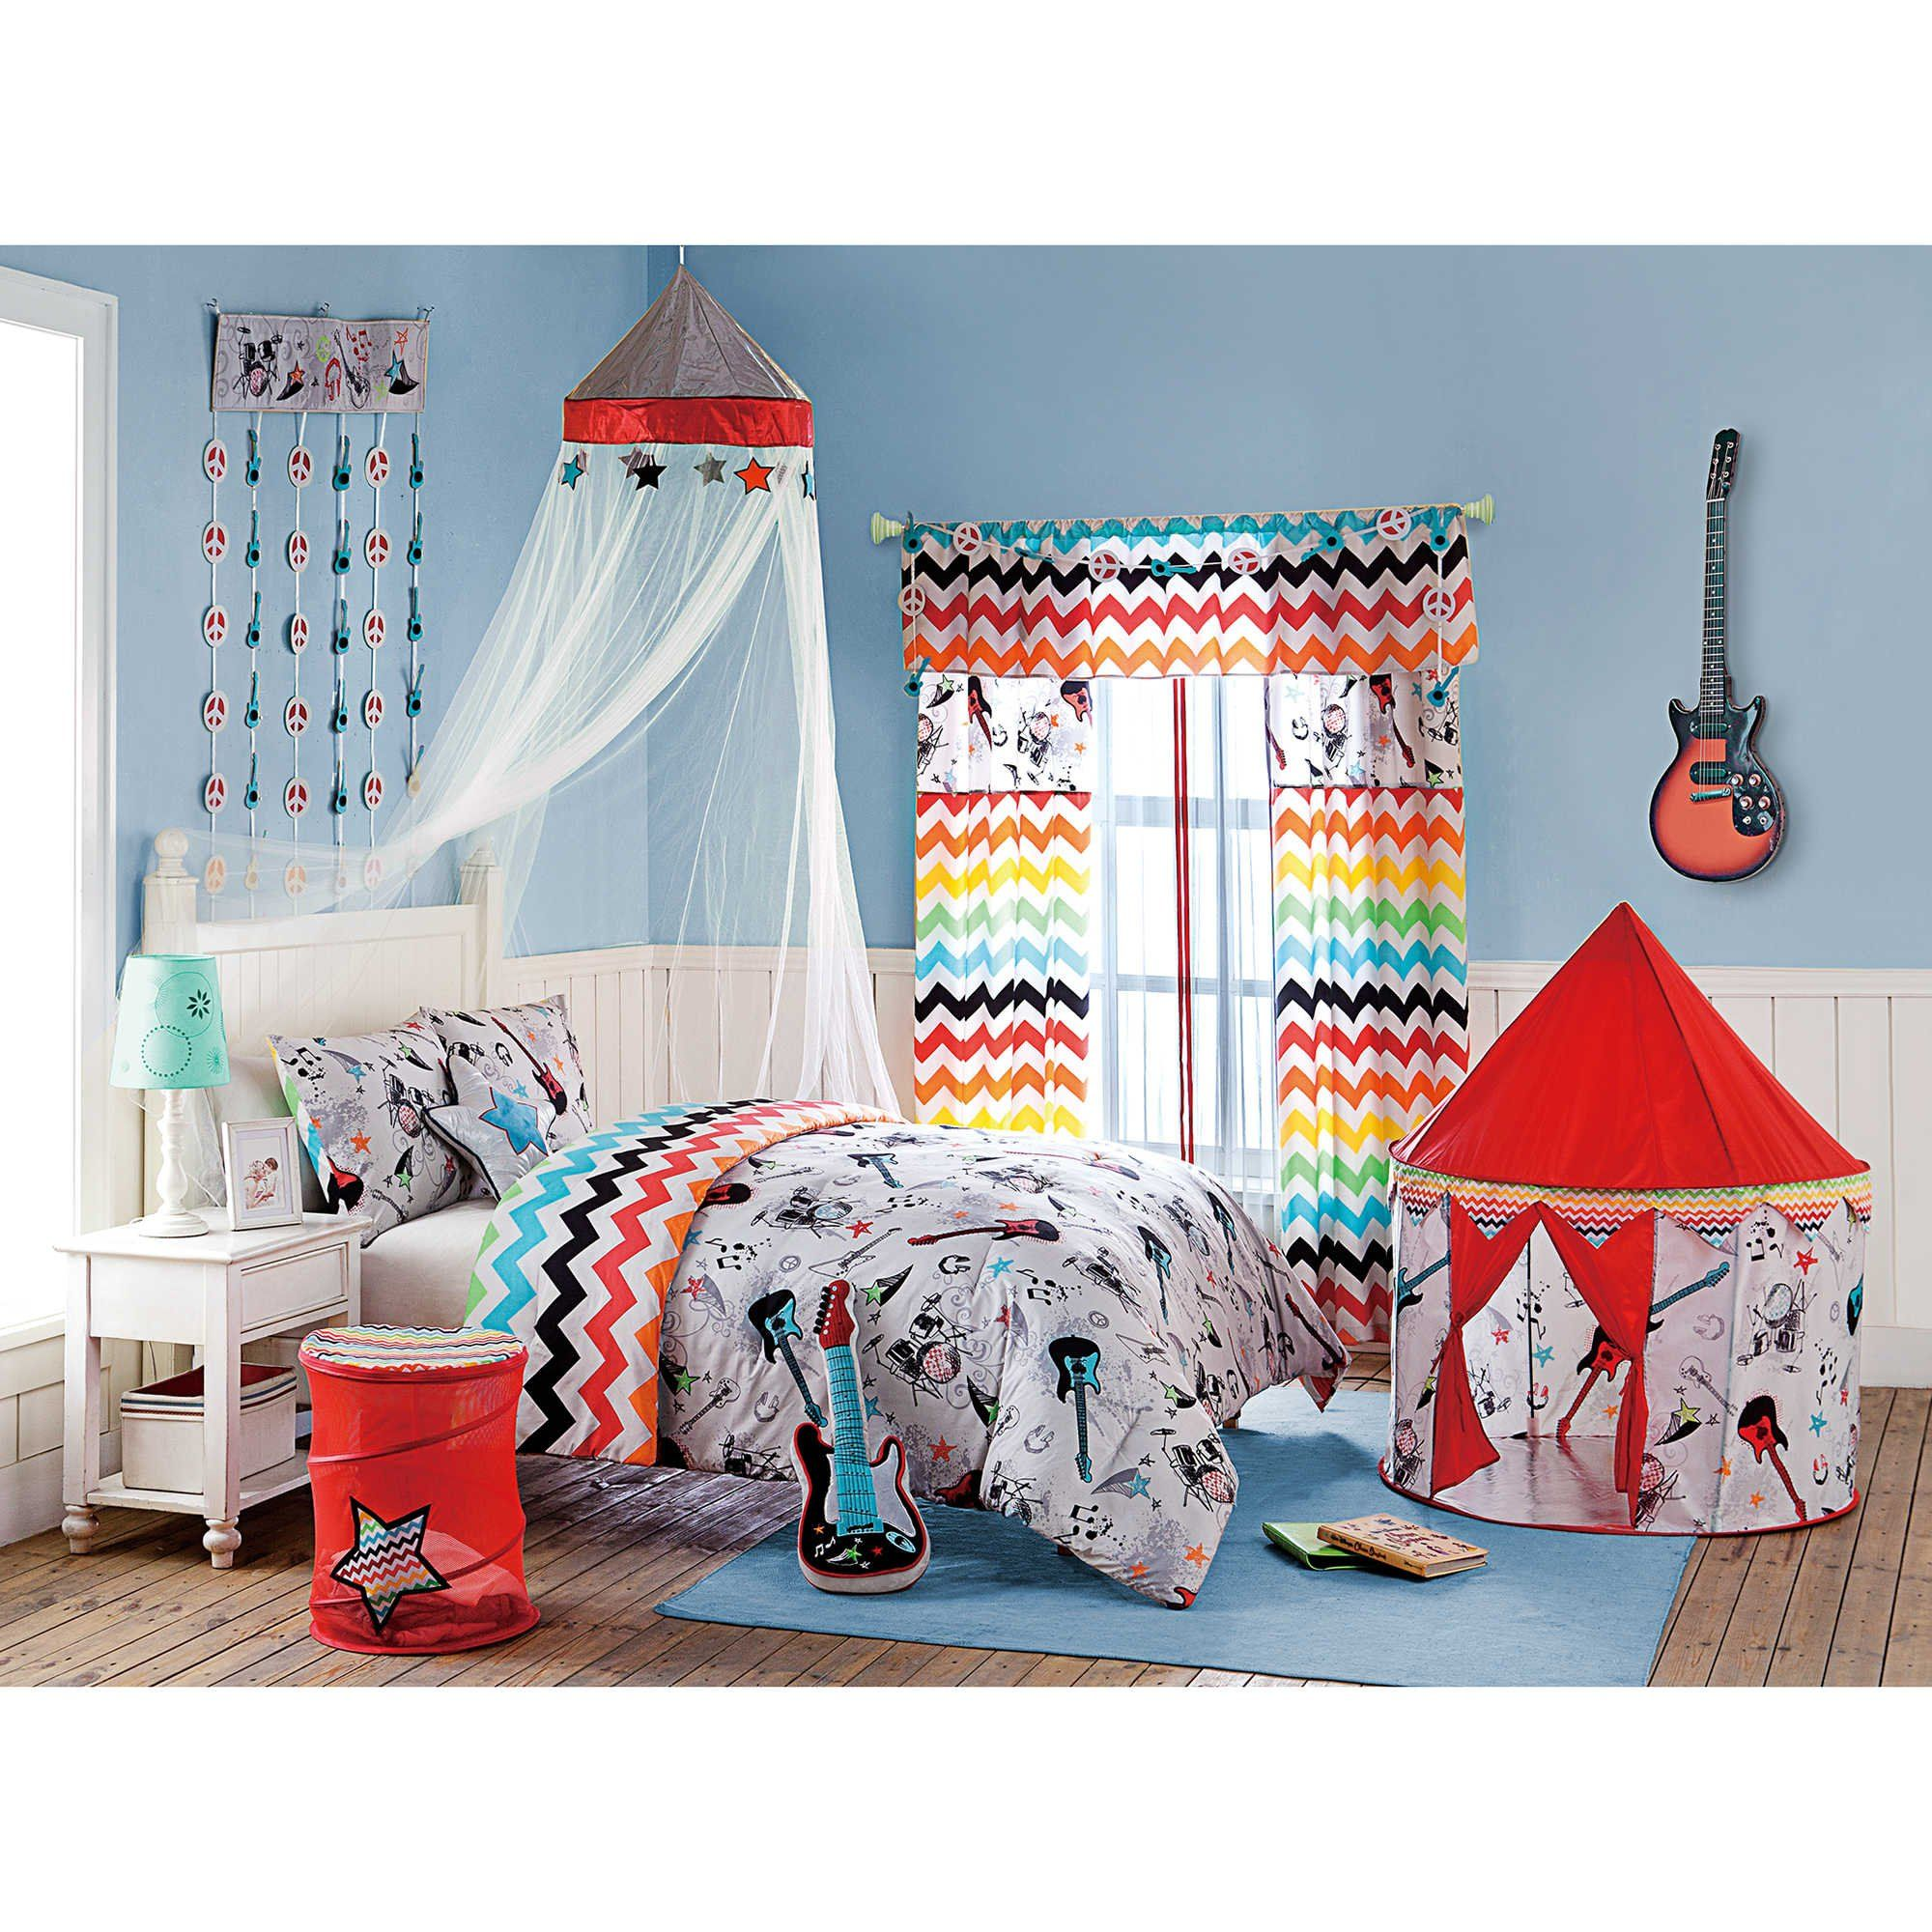 Tent | Pop up tent, Vcny, Kids play tent